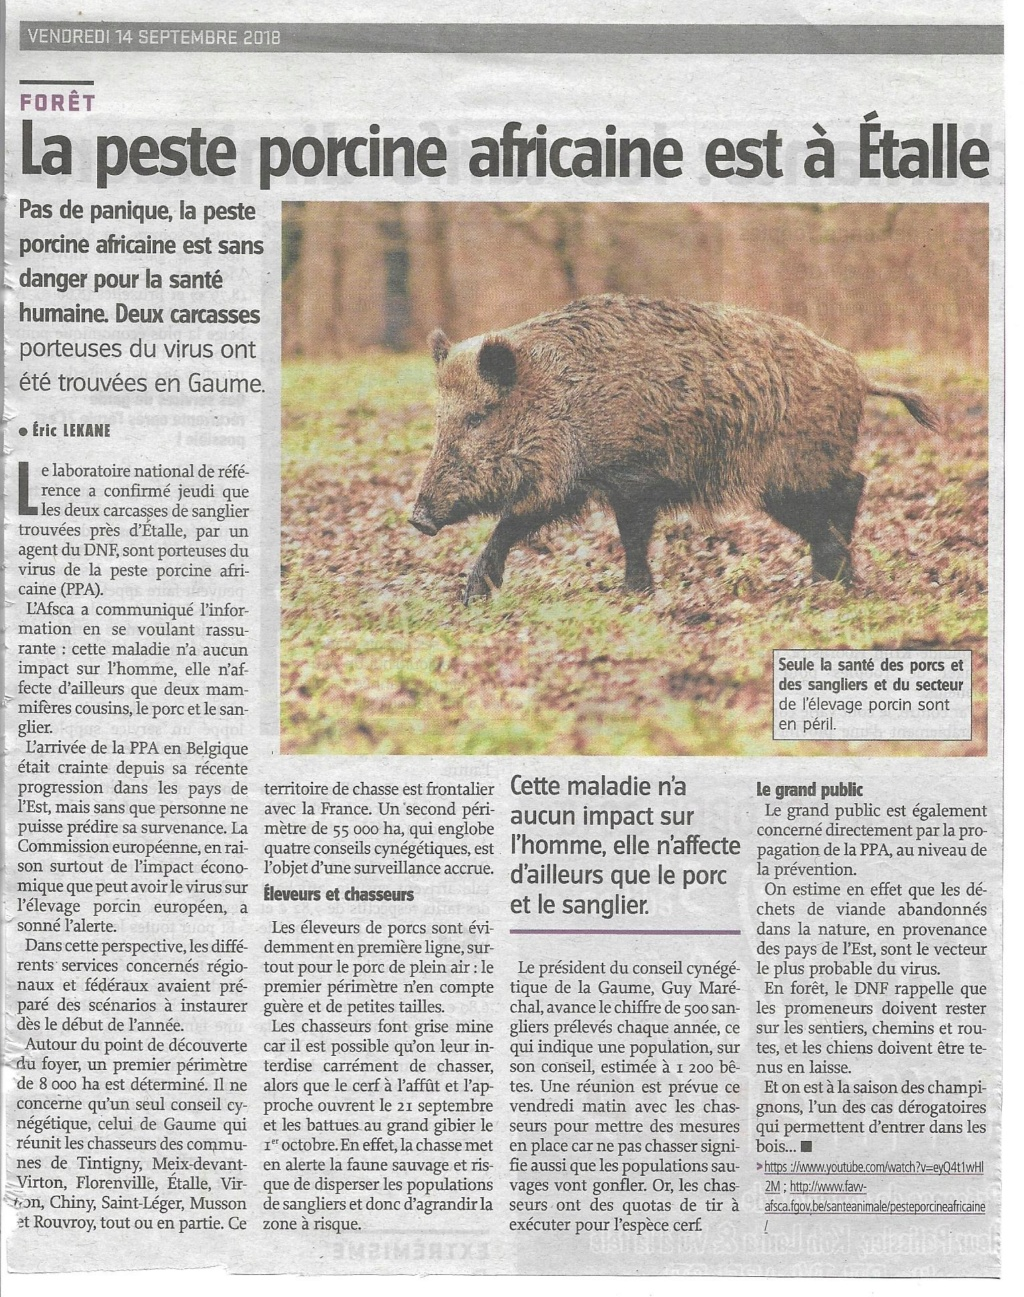 Peste porcine : On est en plein dedans !!! - Page 4 Ppa_av12